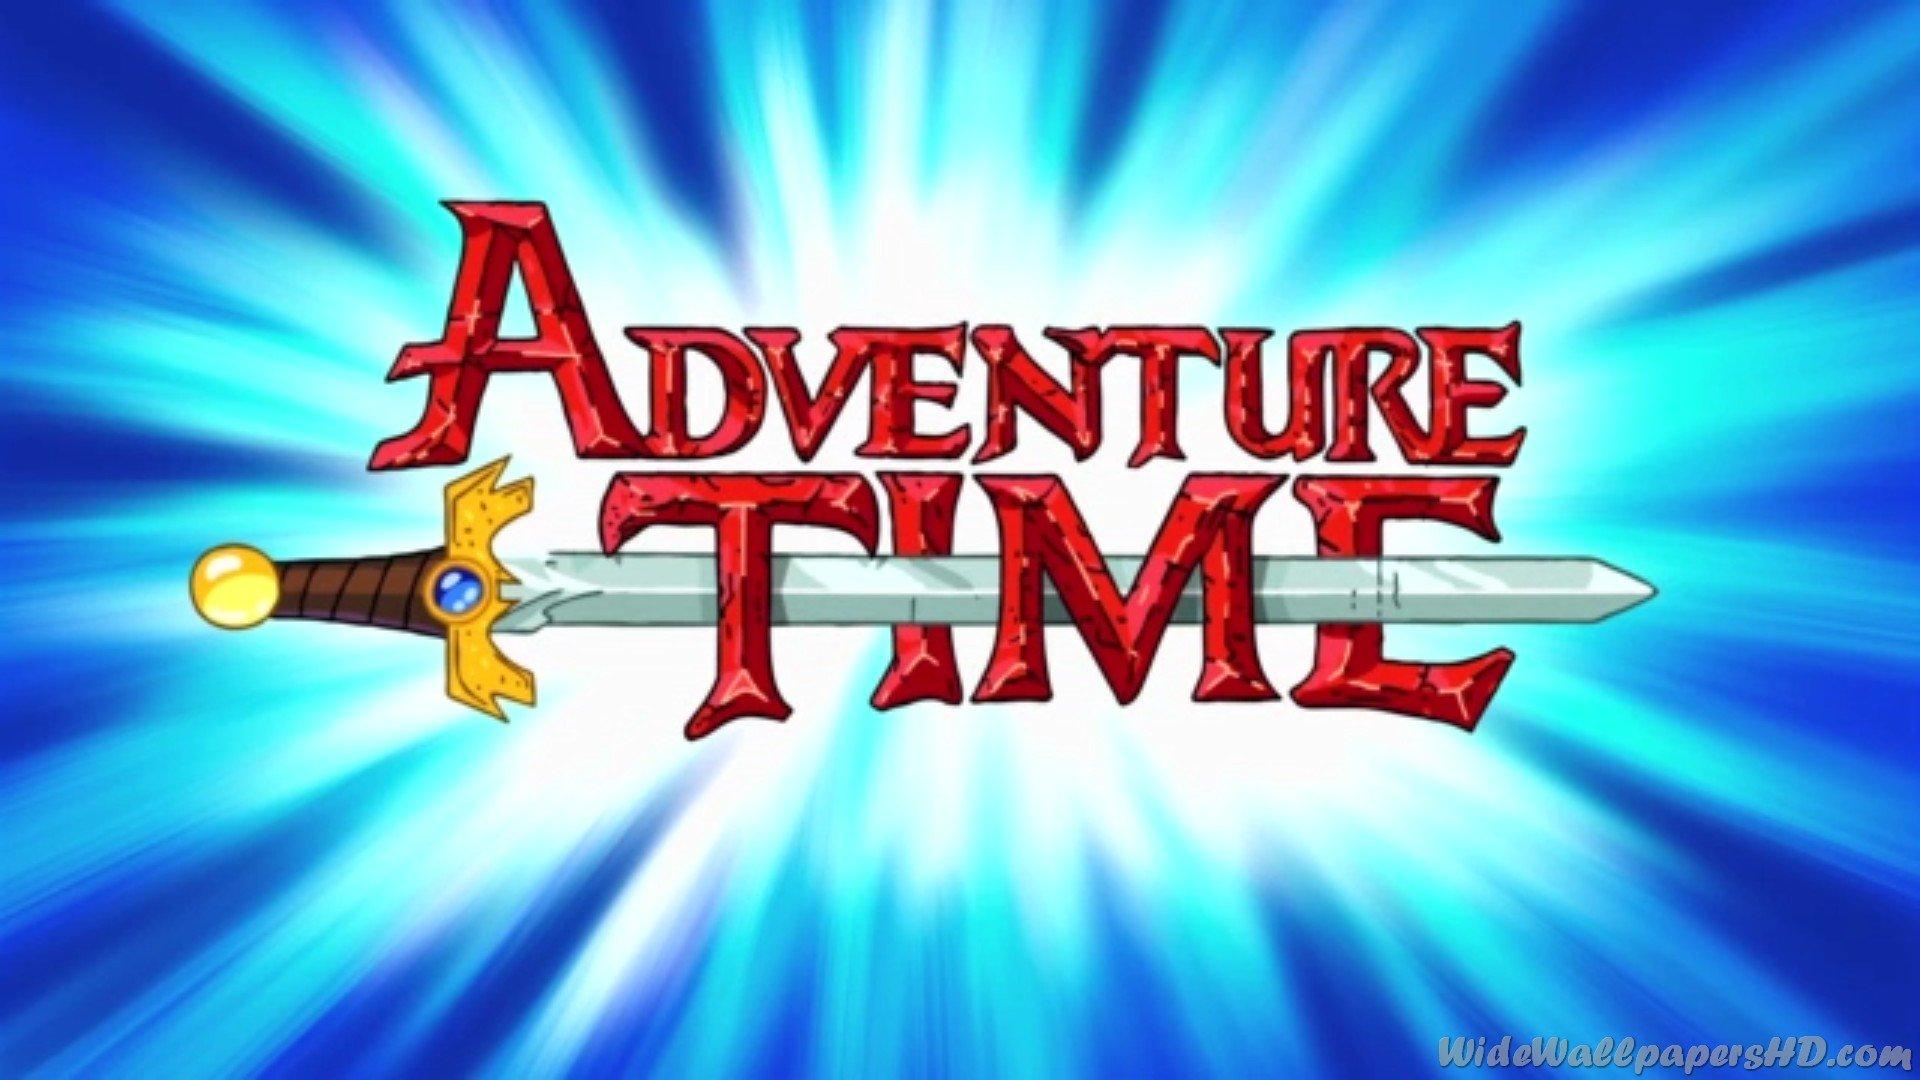 Adventure time Logos.